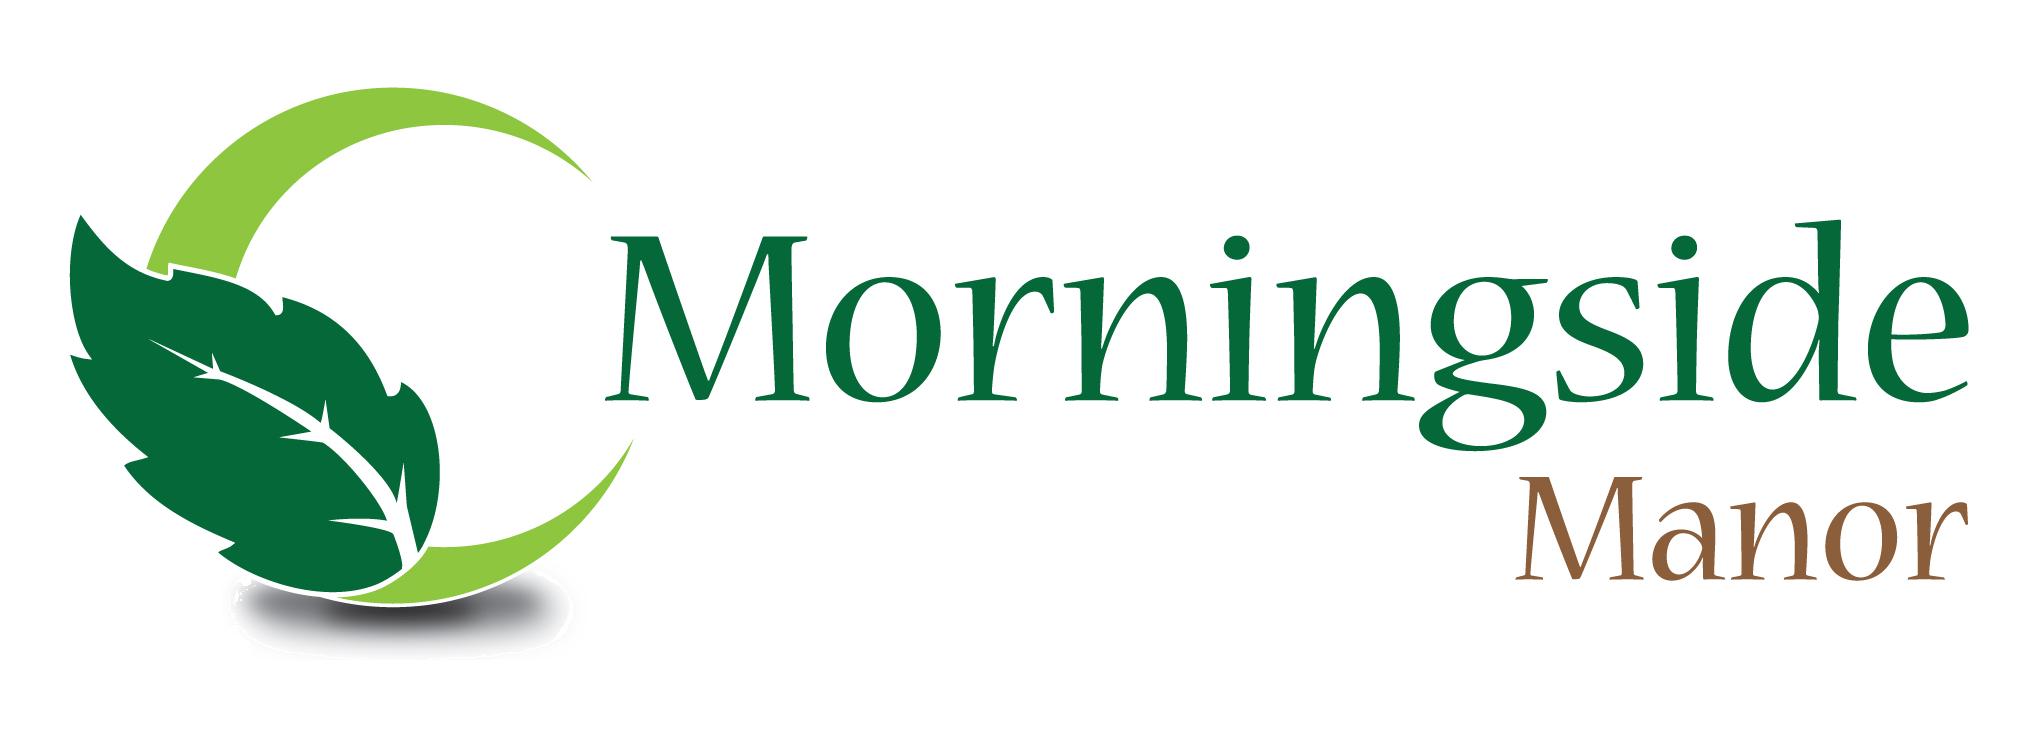 morningside-manor